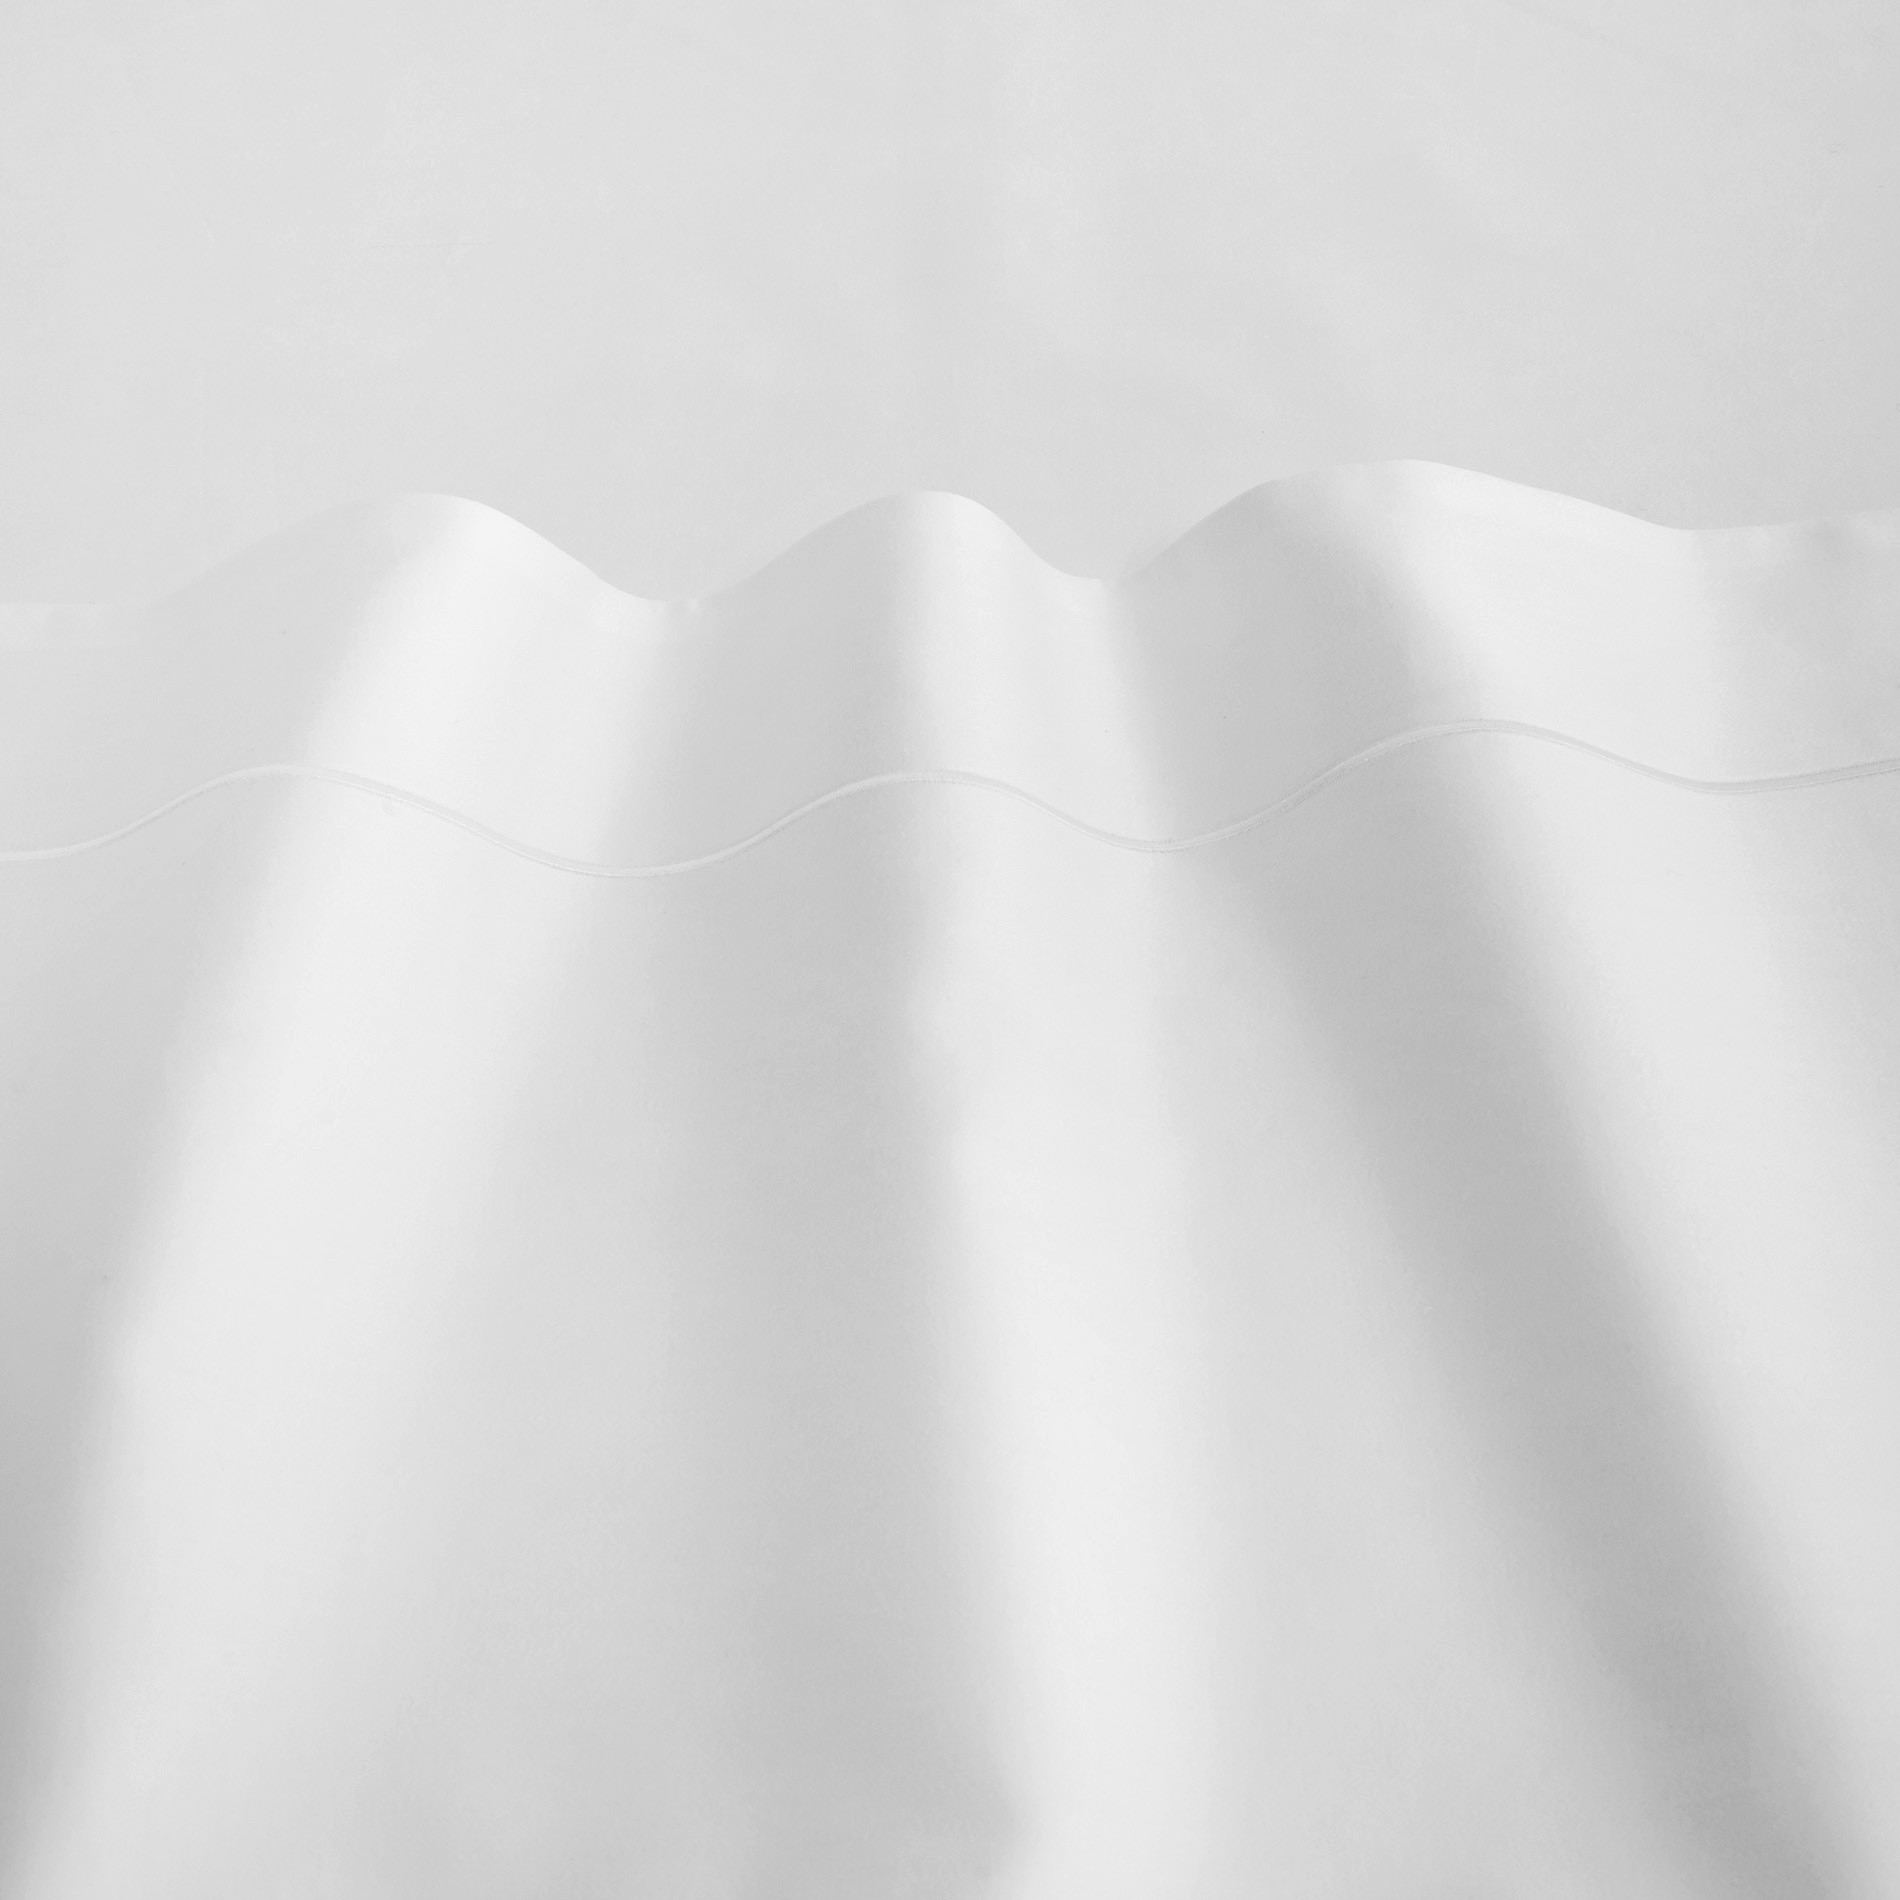 Lenzuolo liscio raso alta qualità Interno 11, Bianco, large image number 2